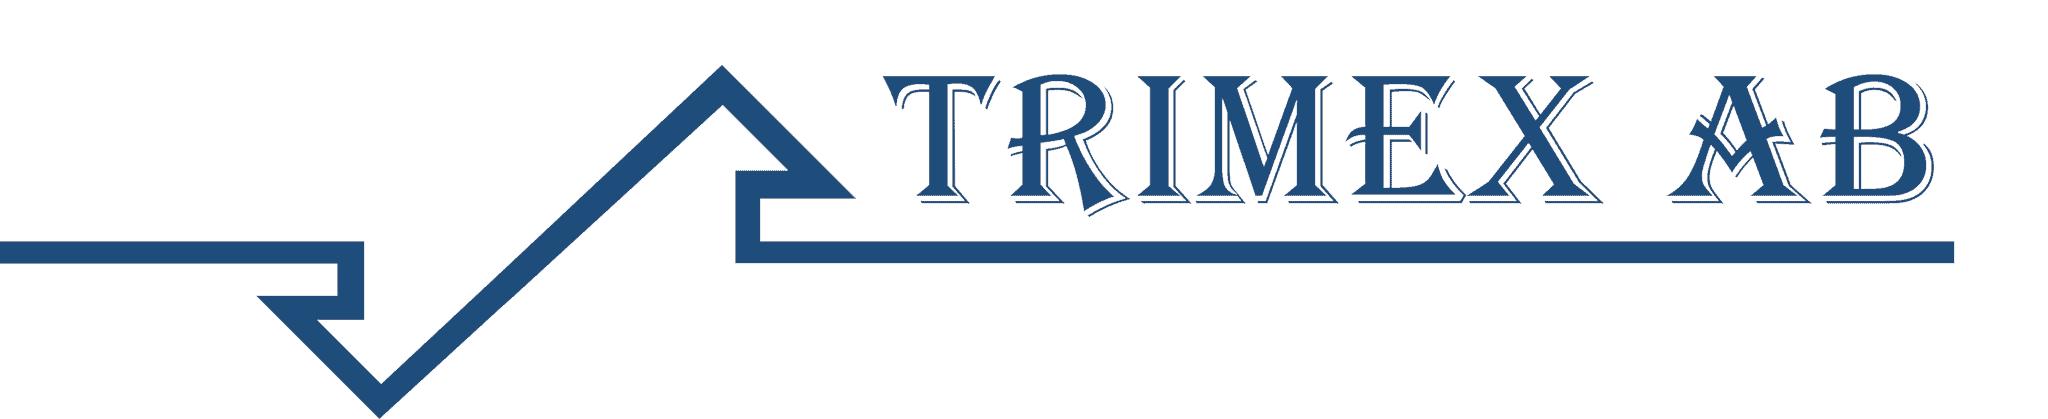 Logotyp för Trimex AB